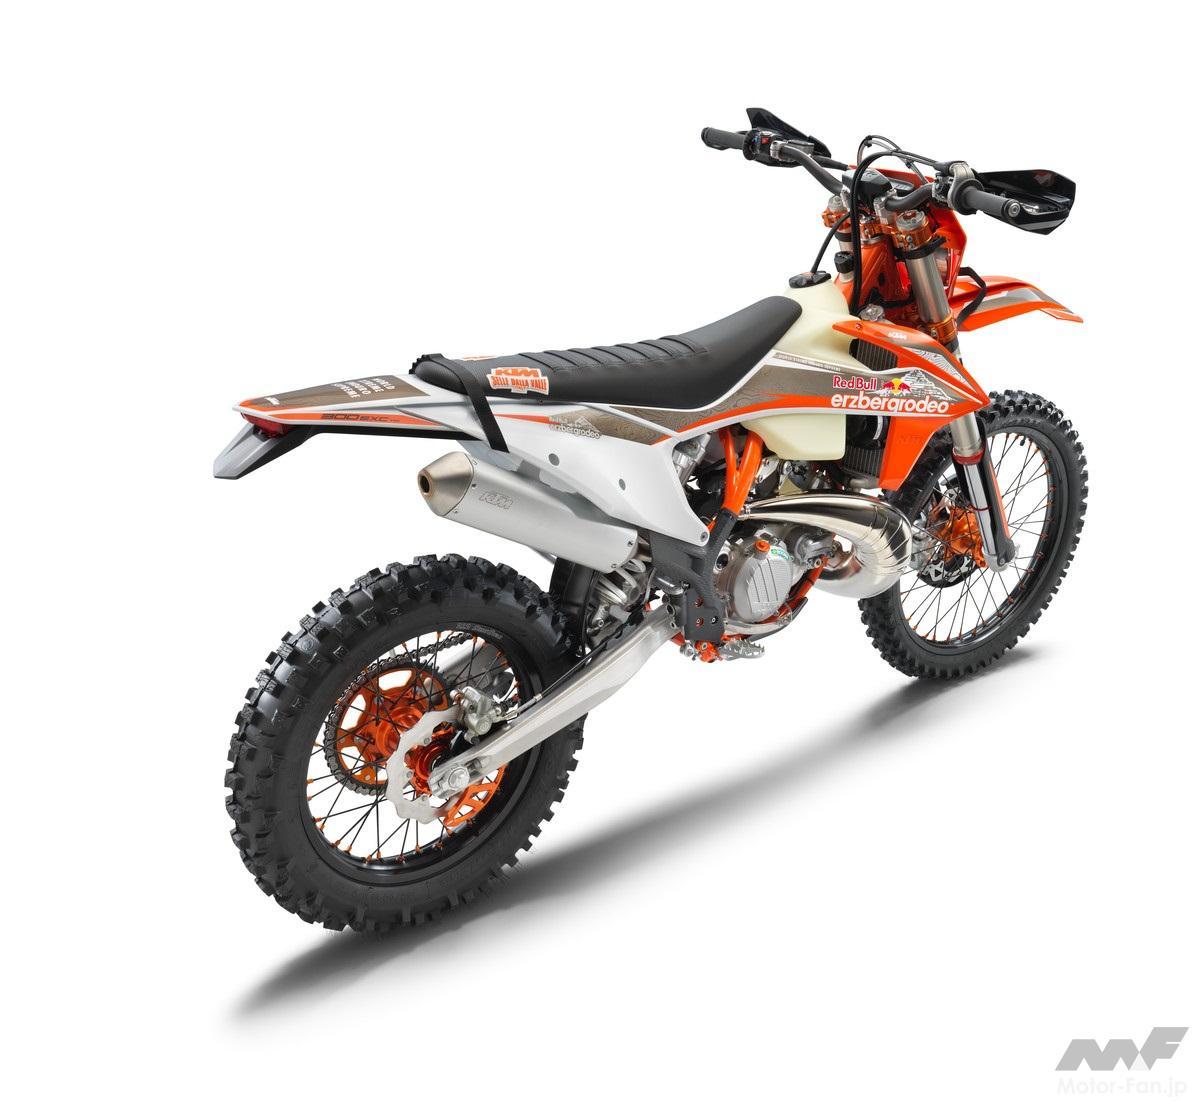 「KTM、MY2022エンデューロモデル12機種を発表」の8枚めの画像